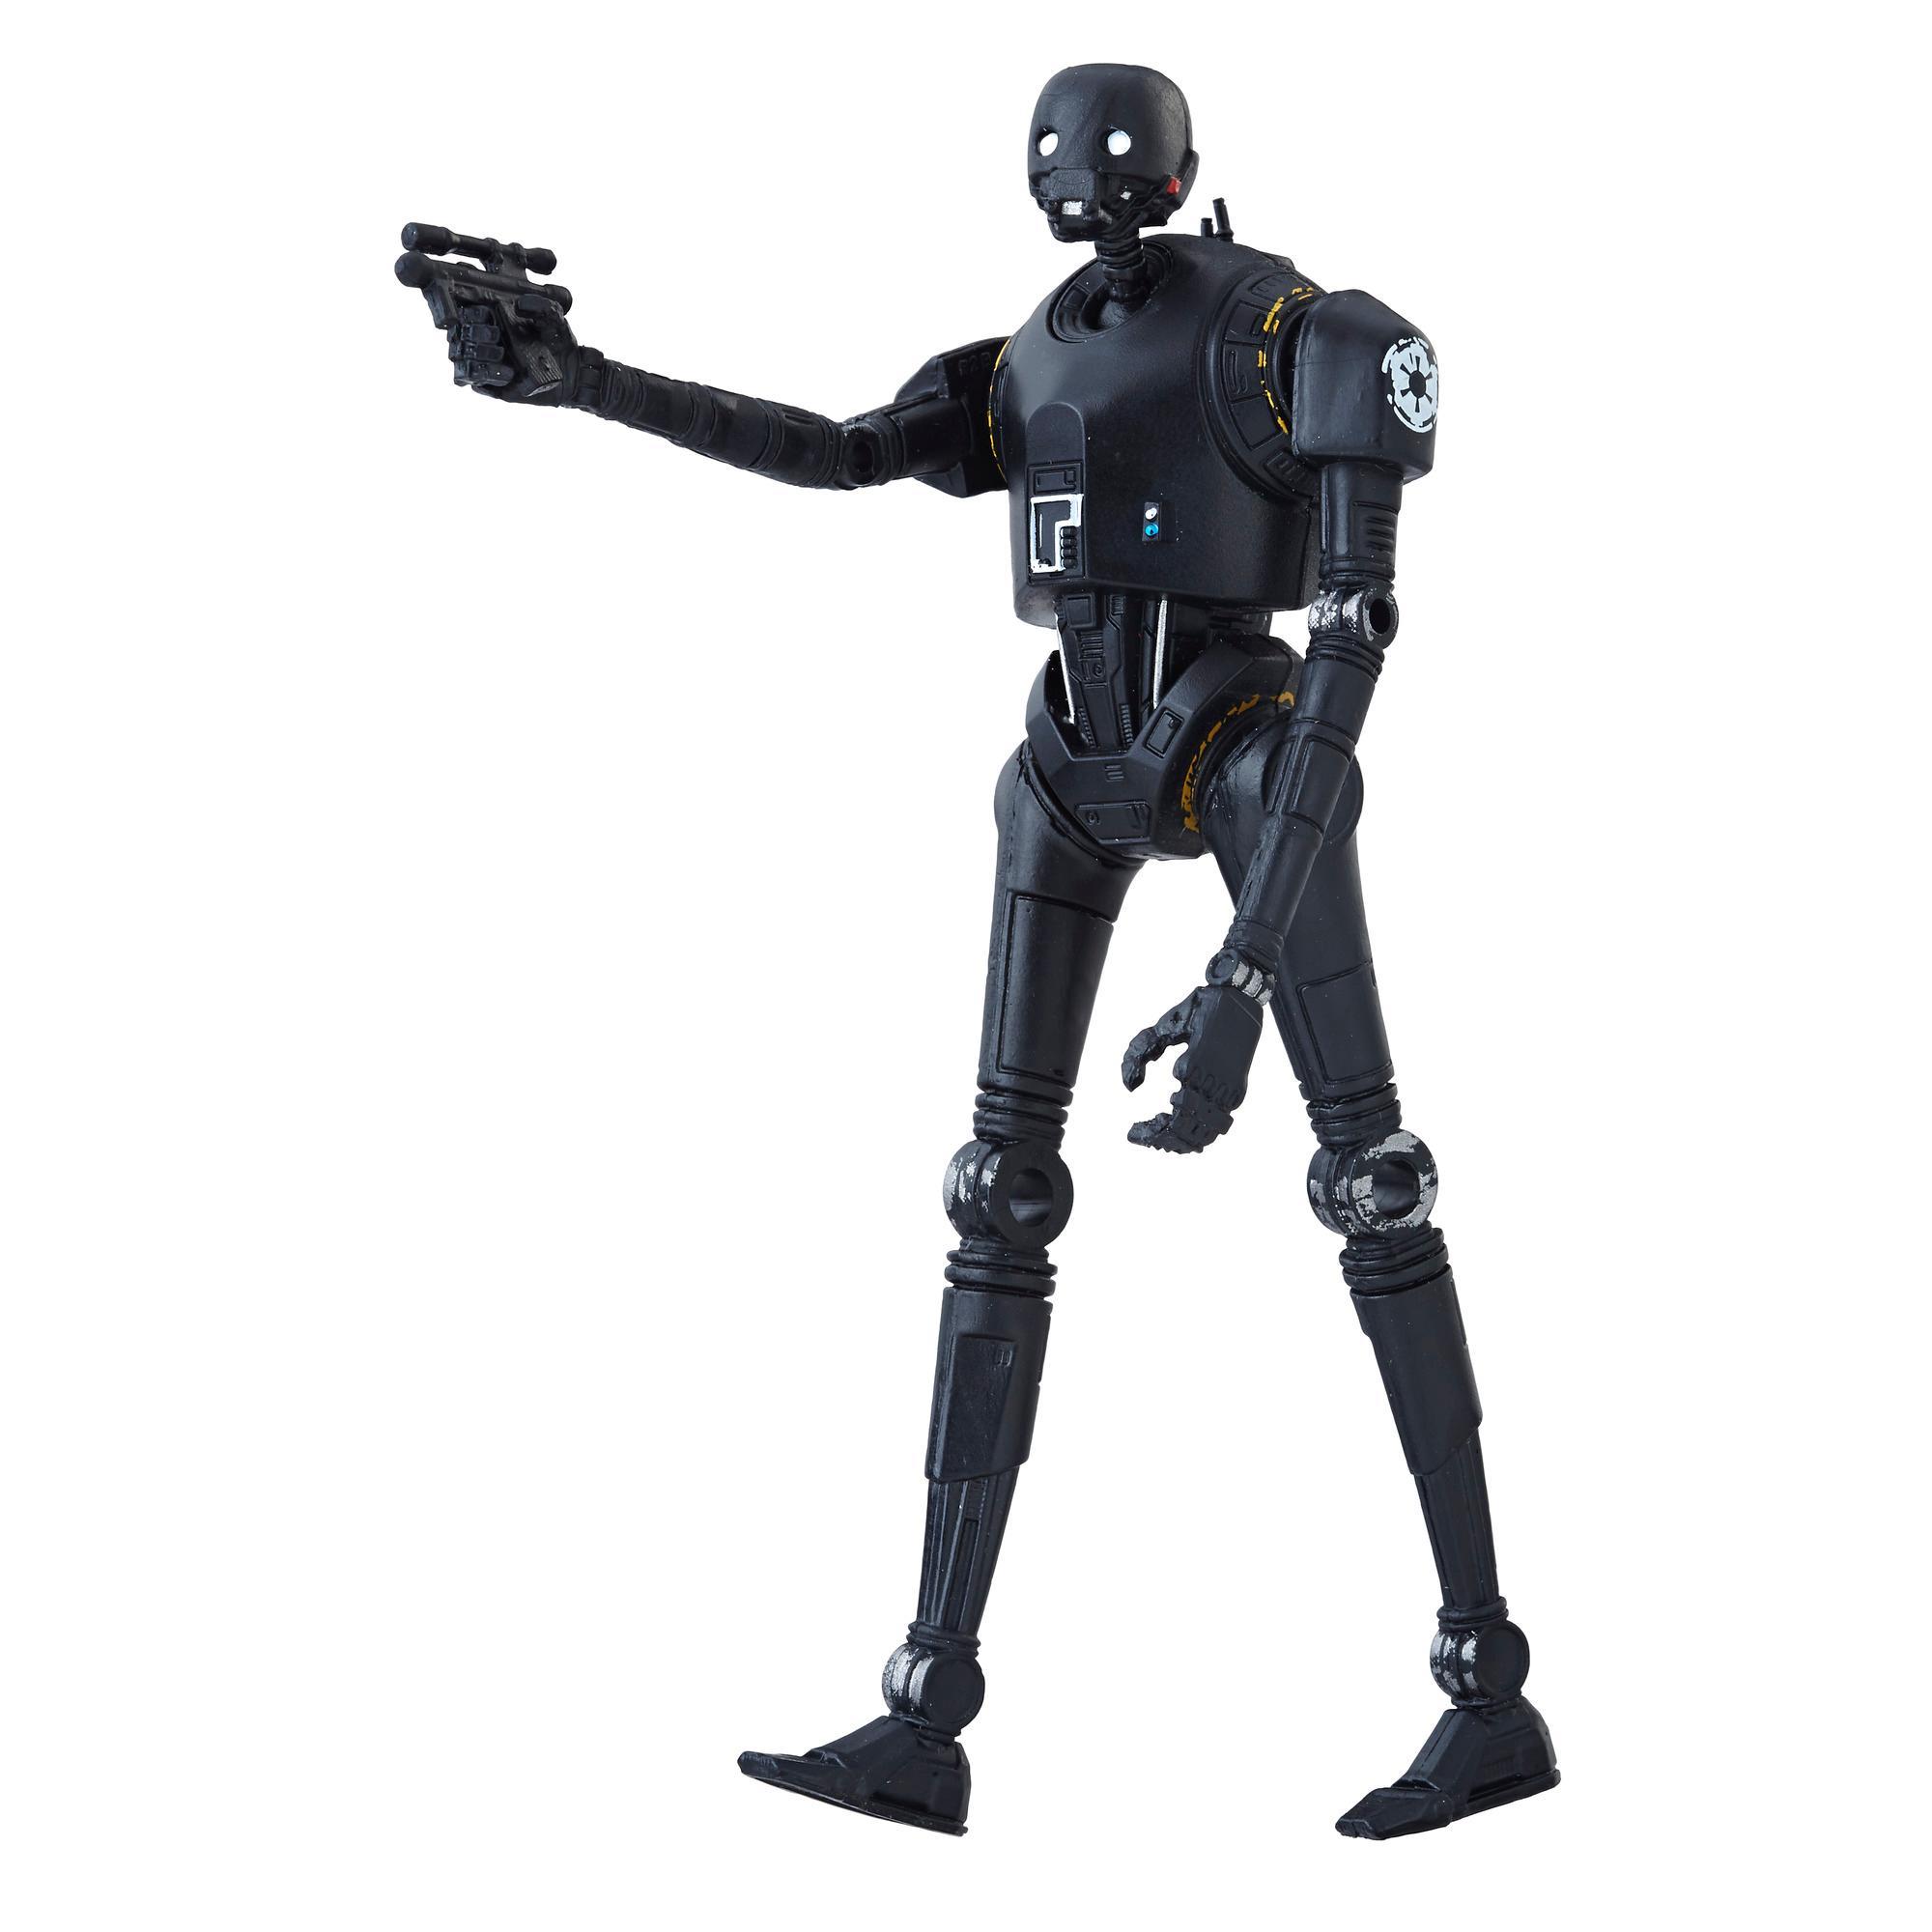 Star Wars Force Link 2.0 K-2SO (Kay-Tuesso) Figure